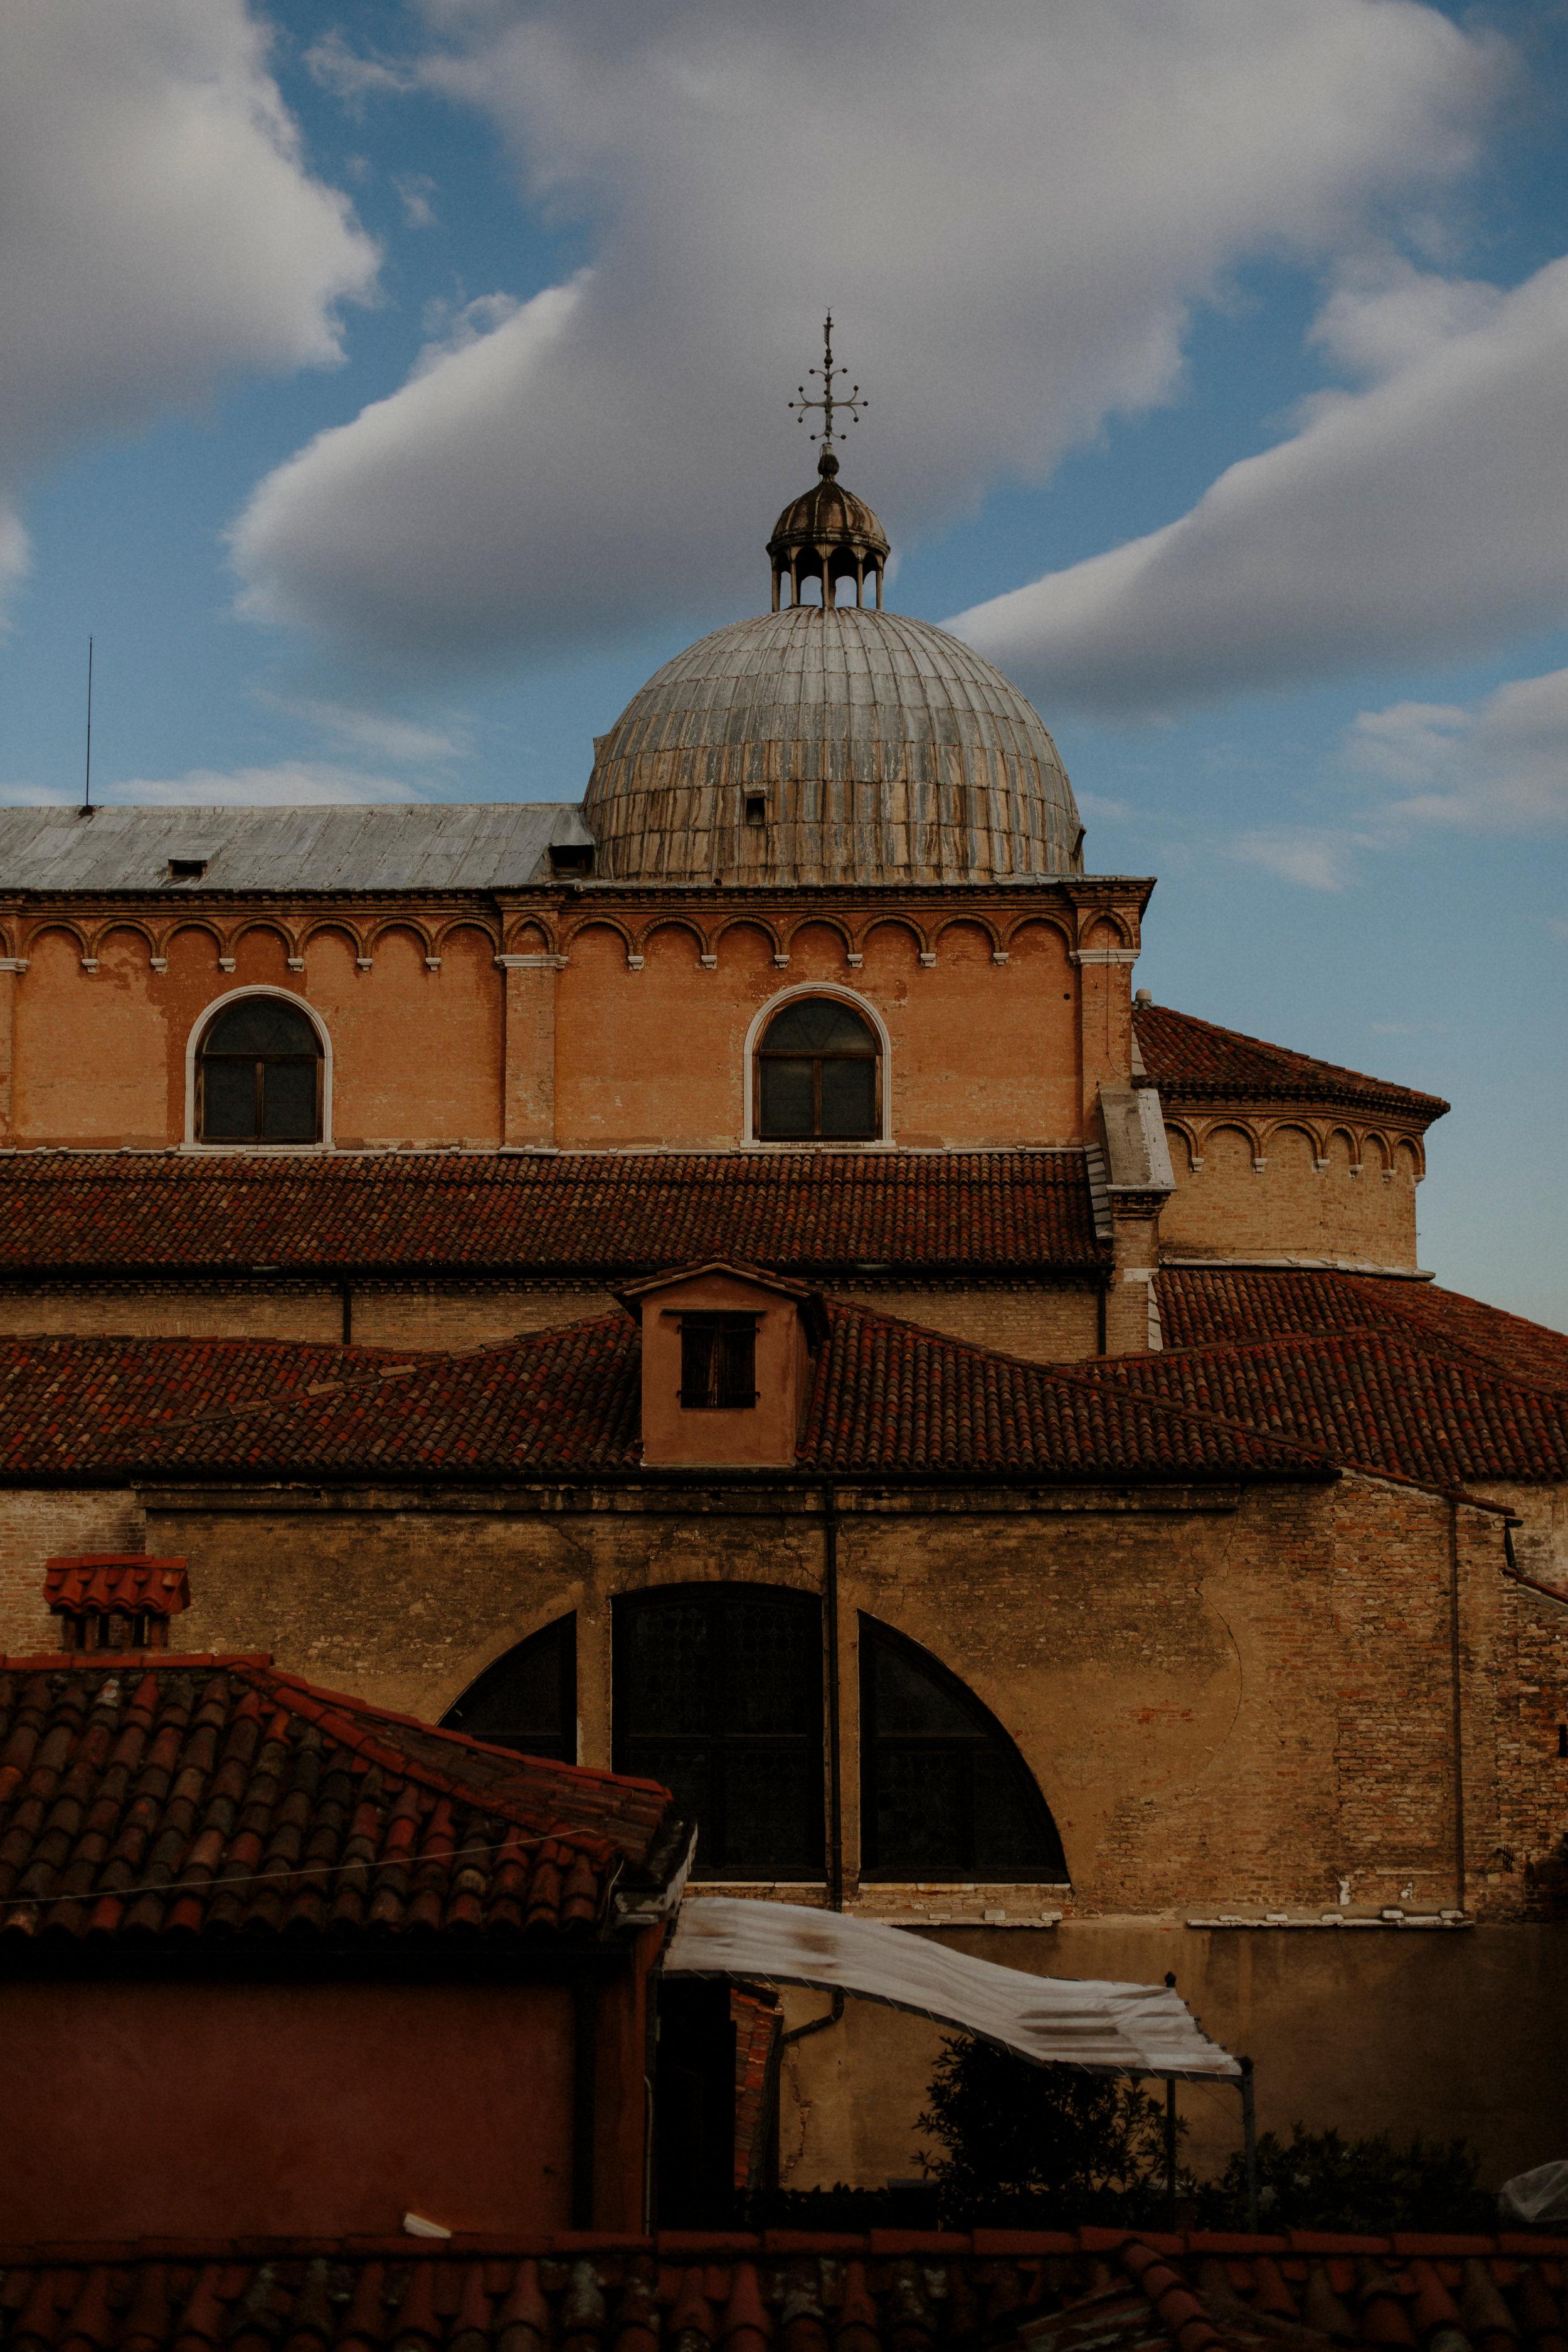 Italy Happily Shavers WebsiteItaly Happily Shavers Website Grain.jpg